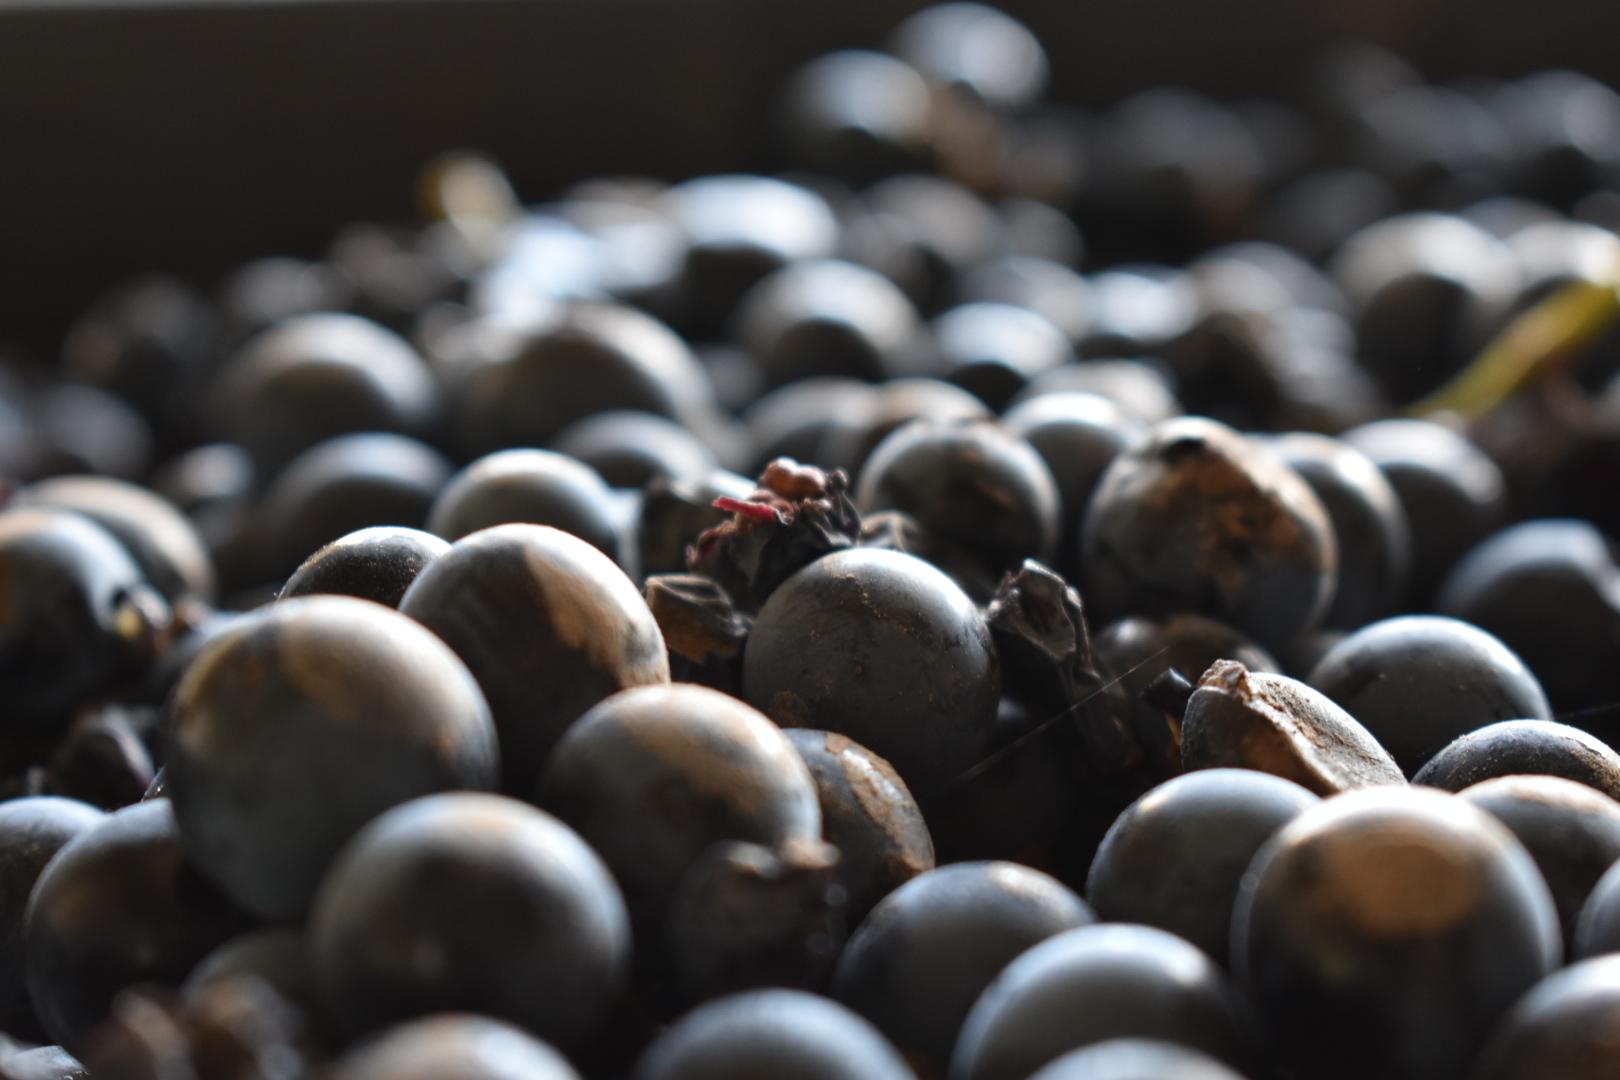 RedPuro Organic Malbec grapes